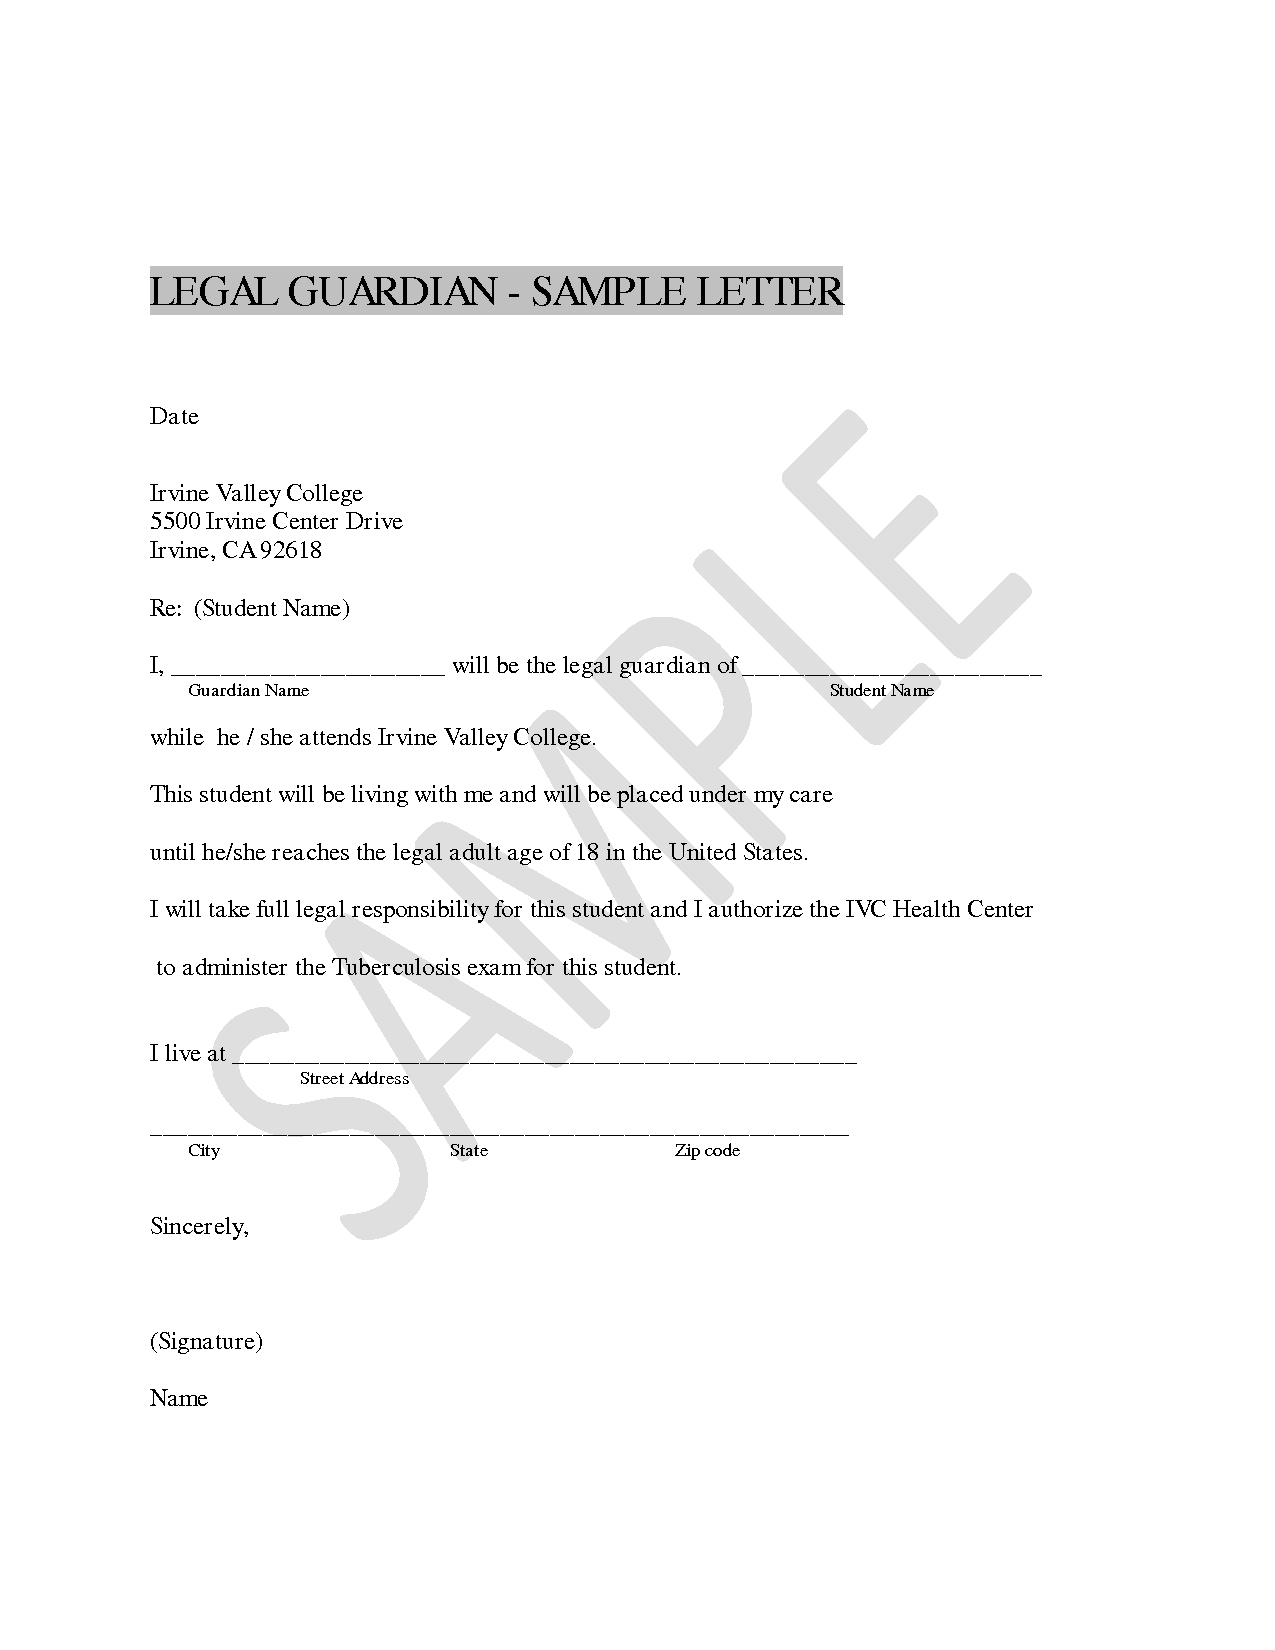 legal guardianship letter template sample letter intent foruardianship best s senior child for